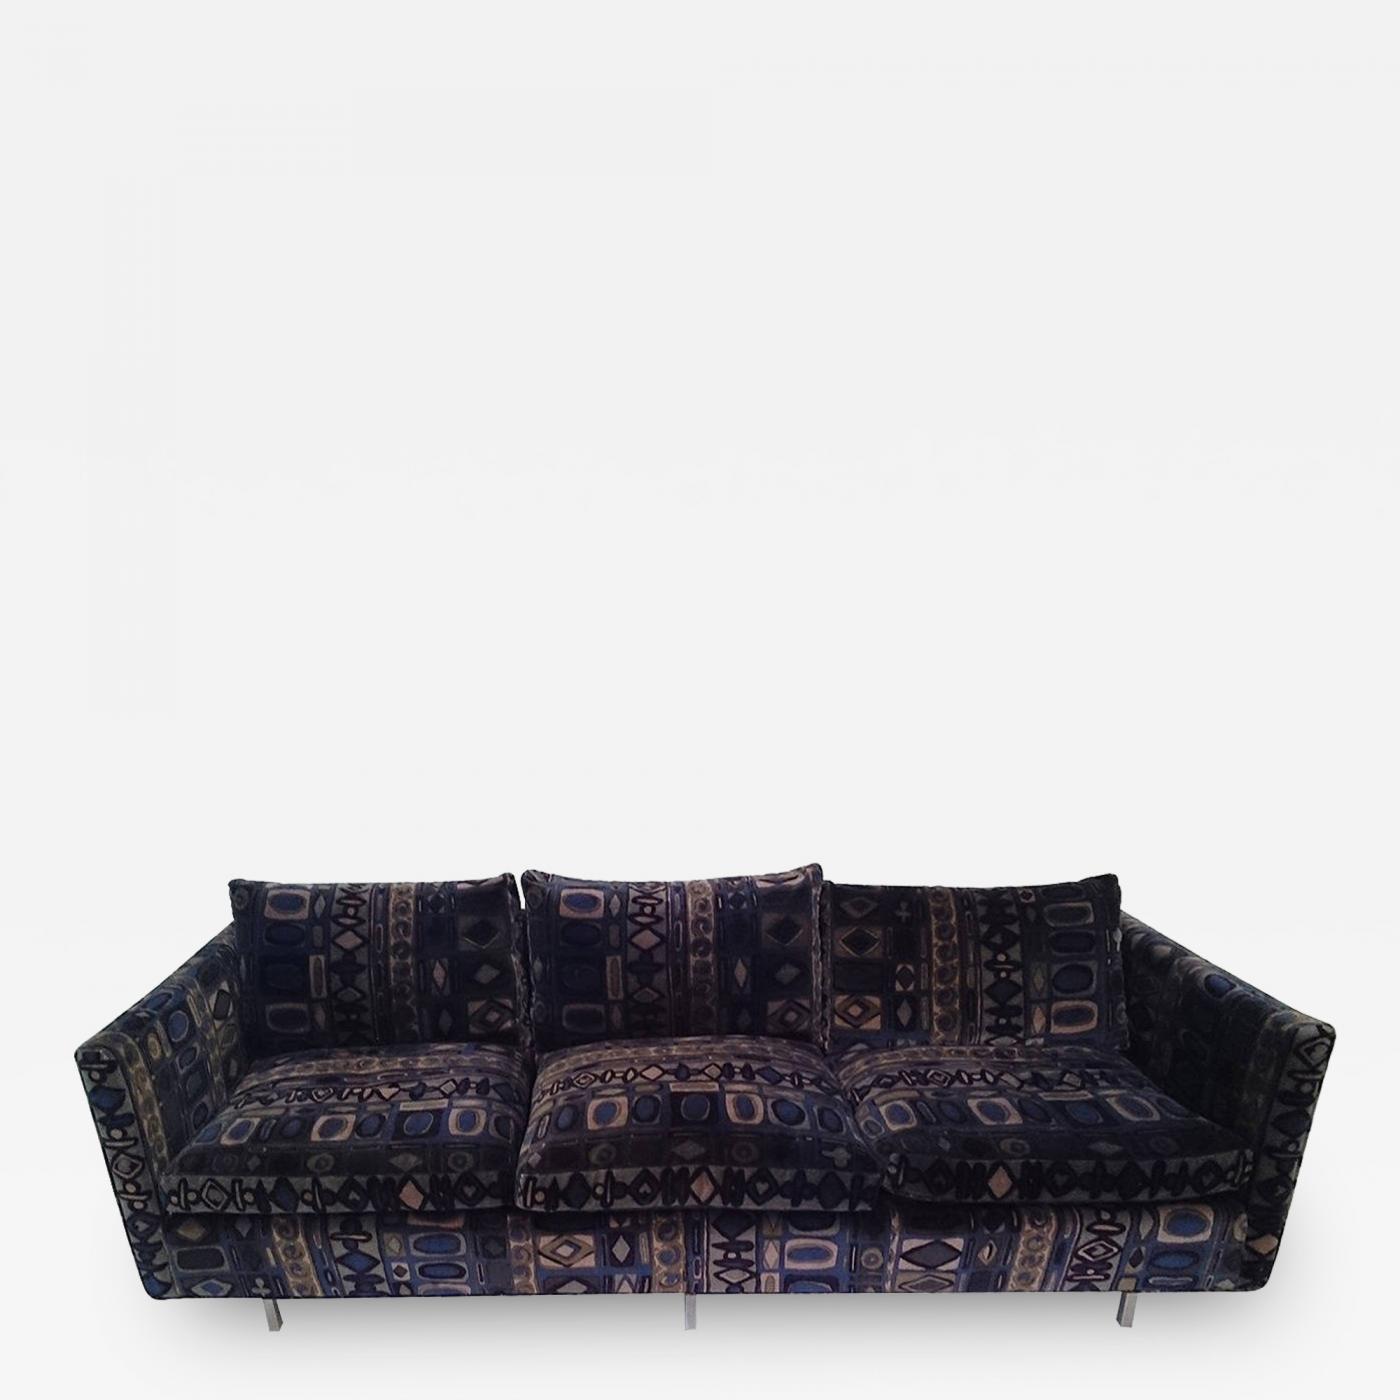 Listings / Furniture / Seating / Sofas · Milo Baughman ...